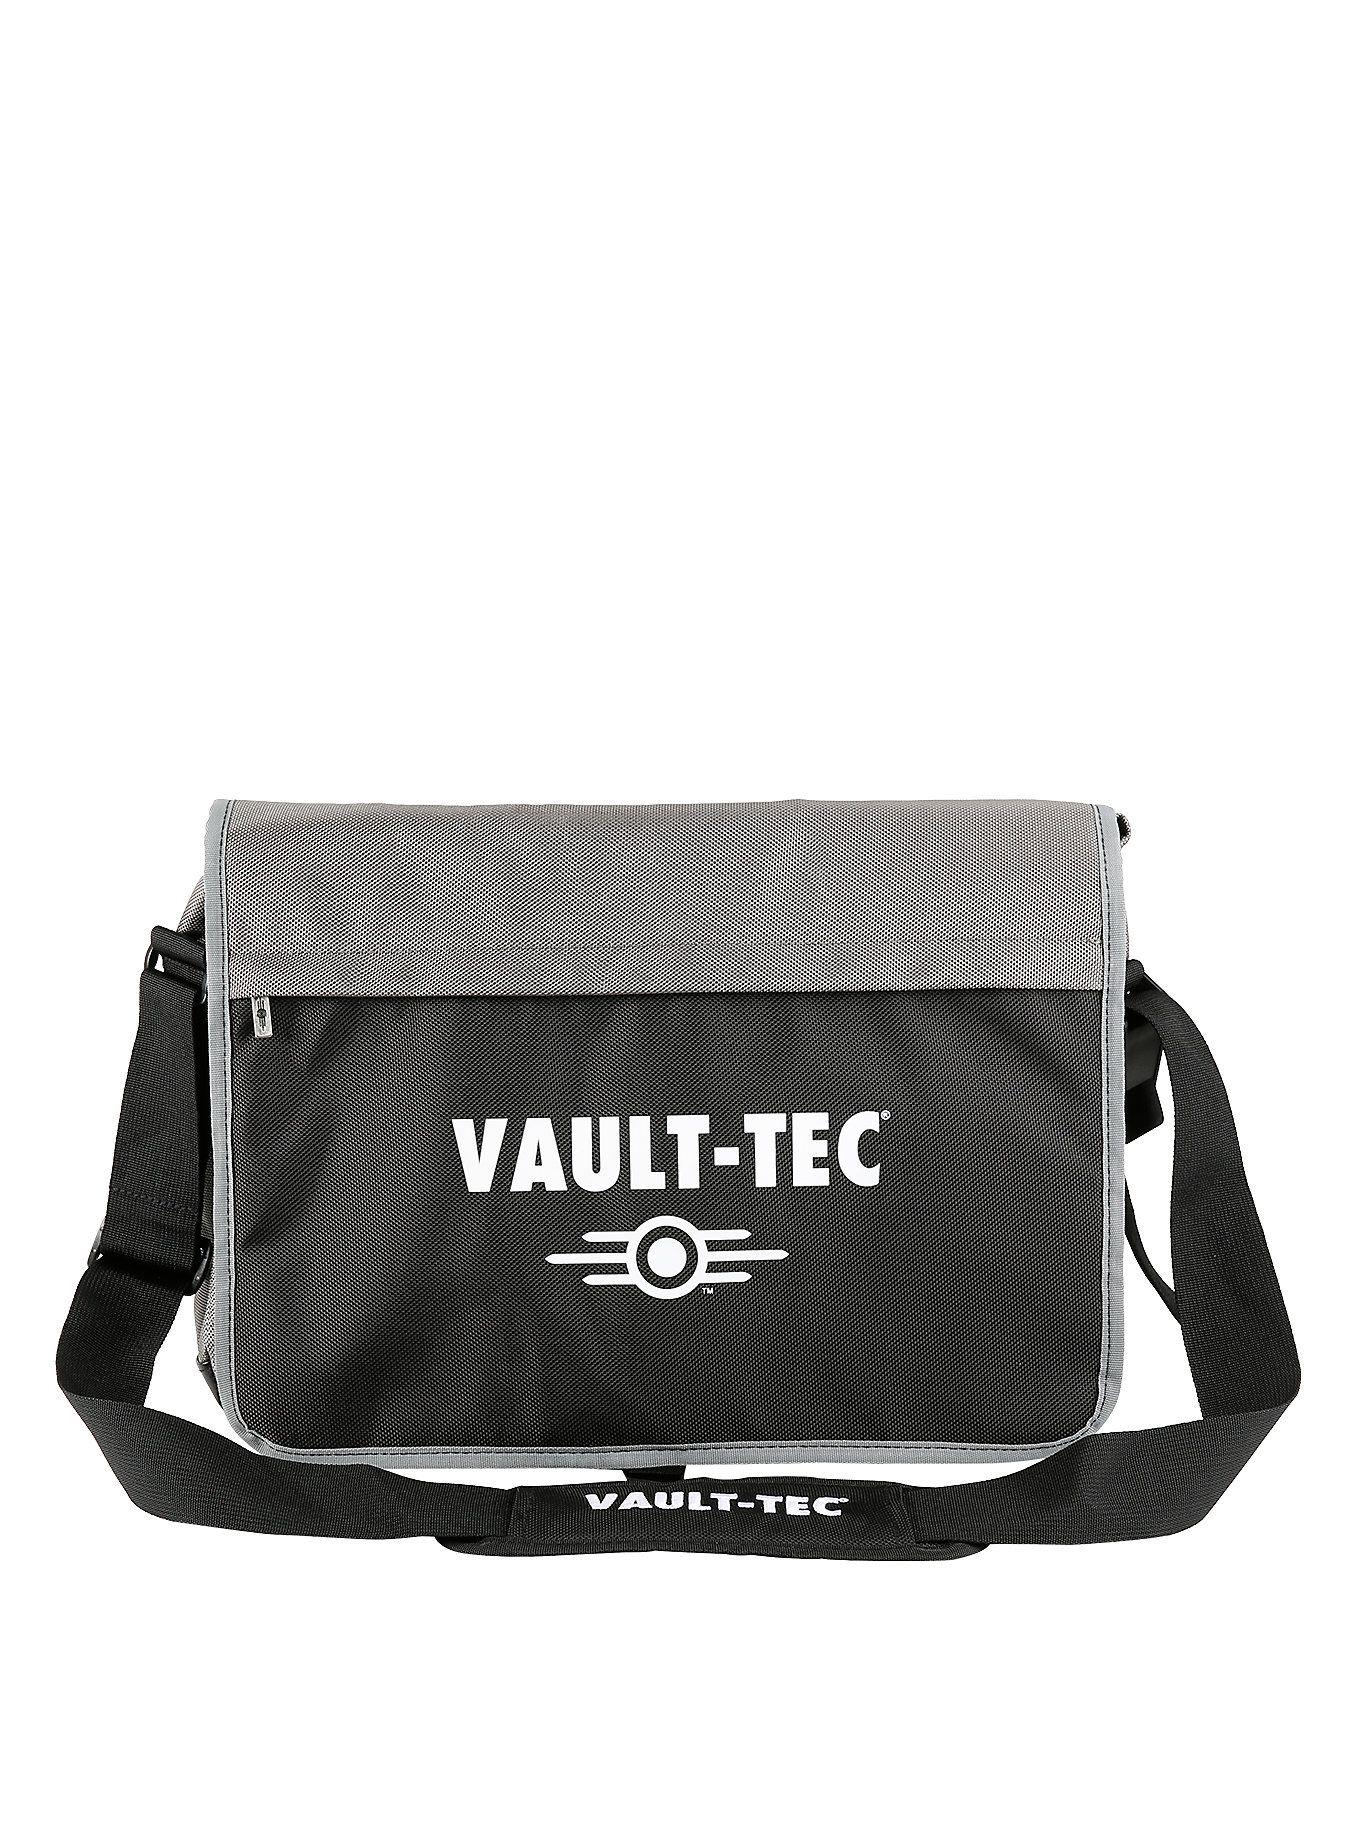 Fallout Vault Tec General Issue Survival Messenger Bag